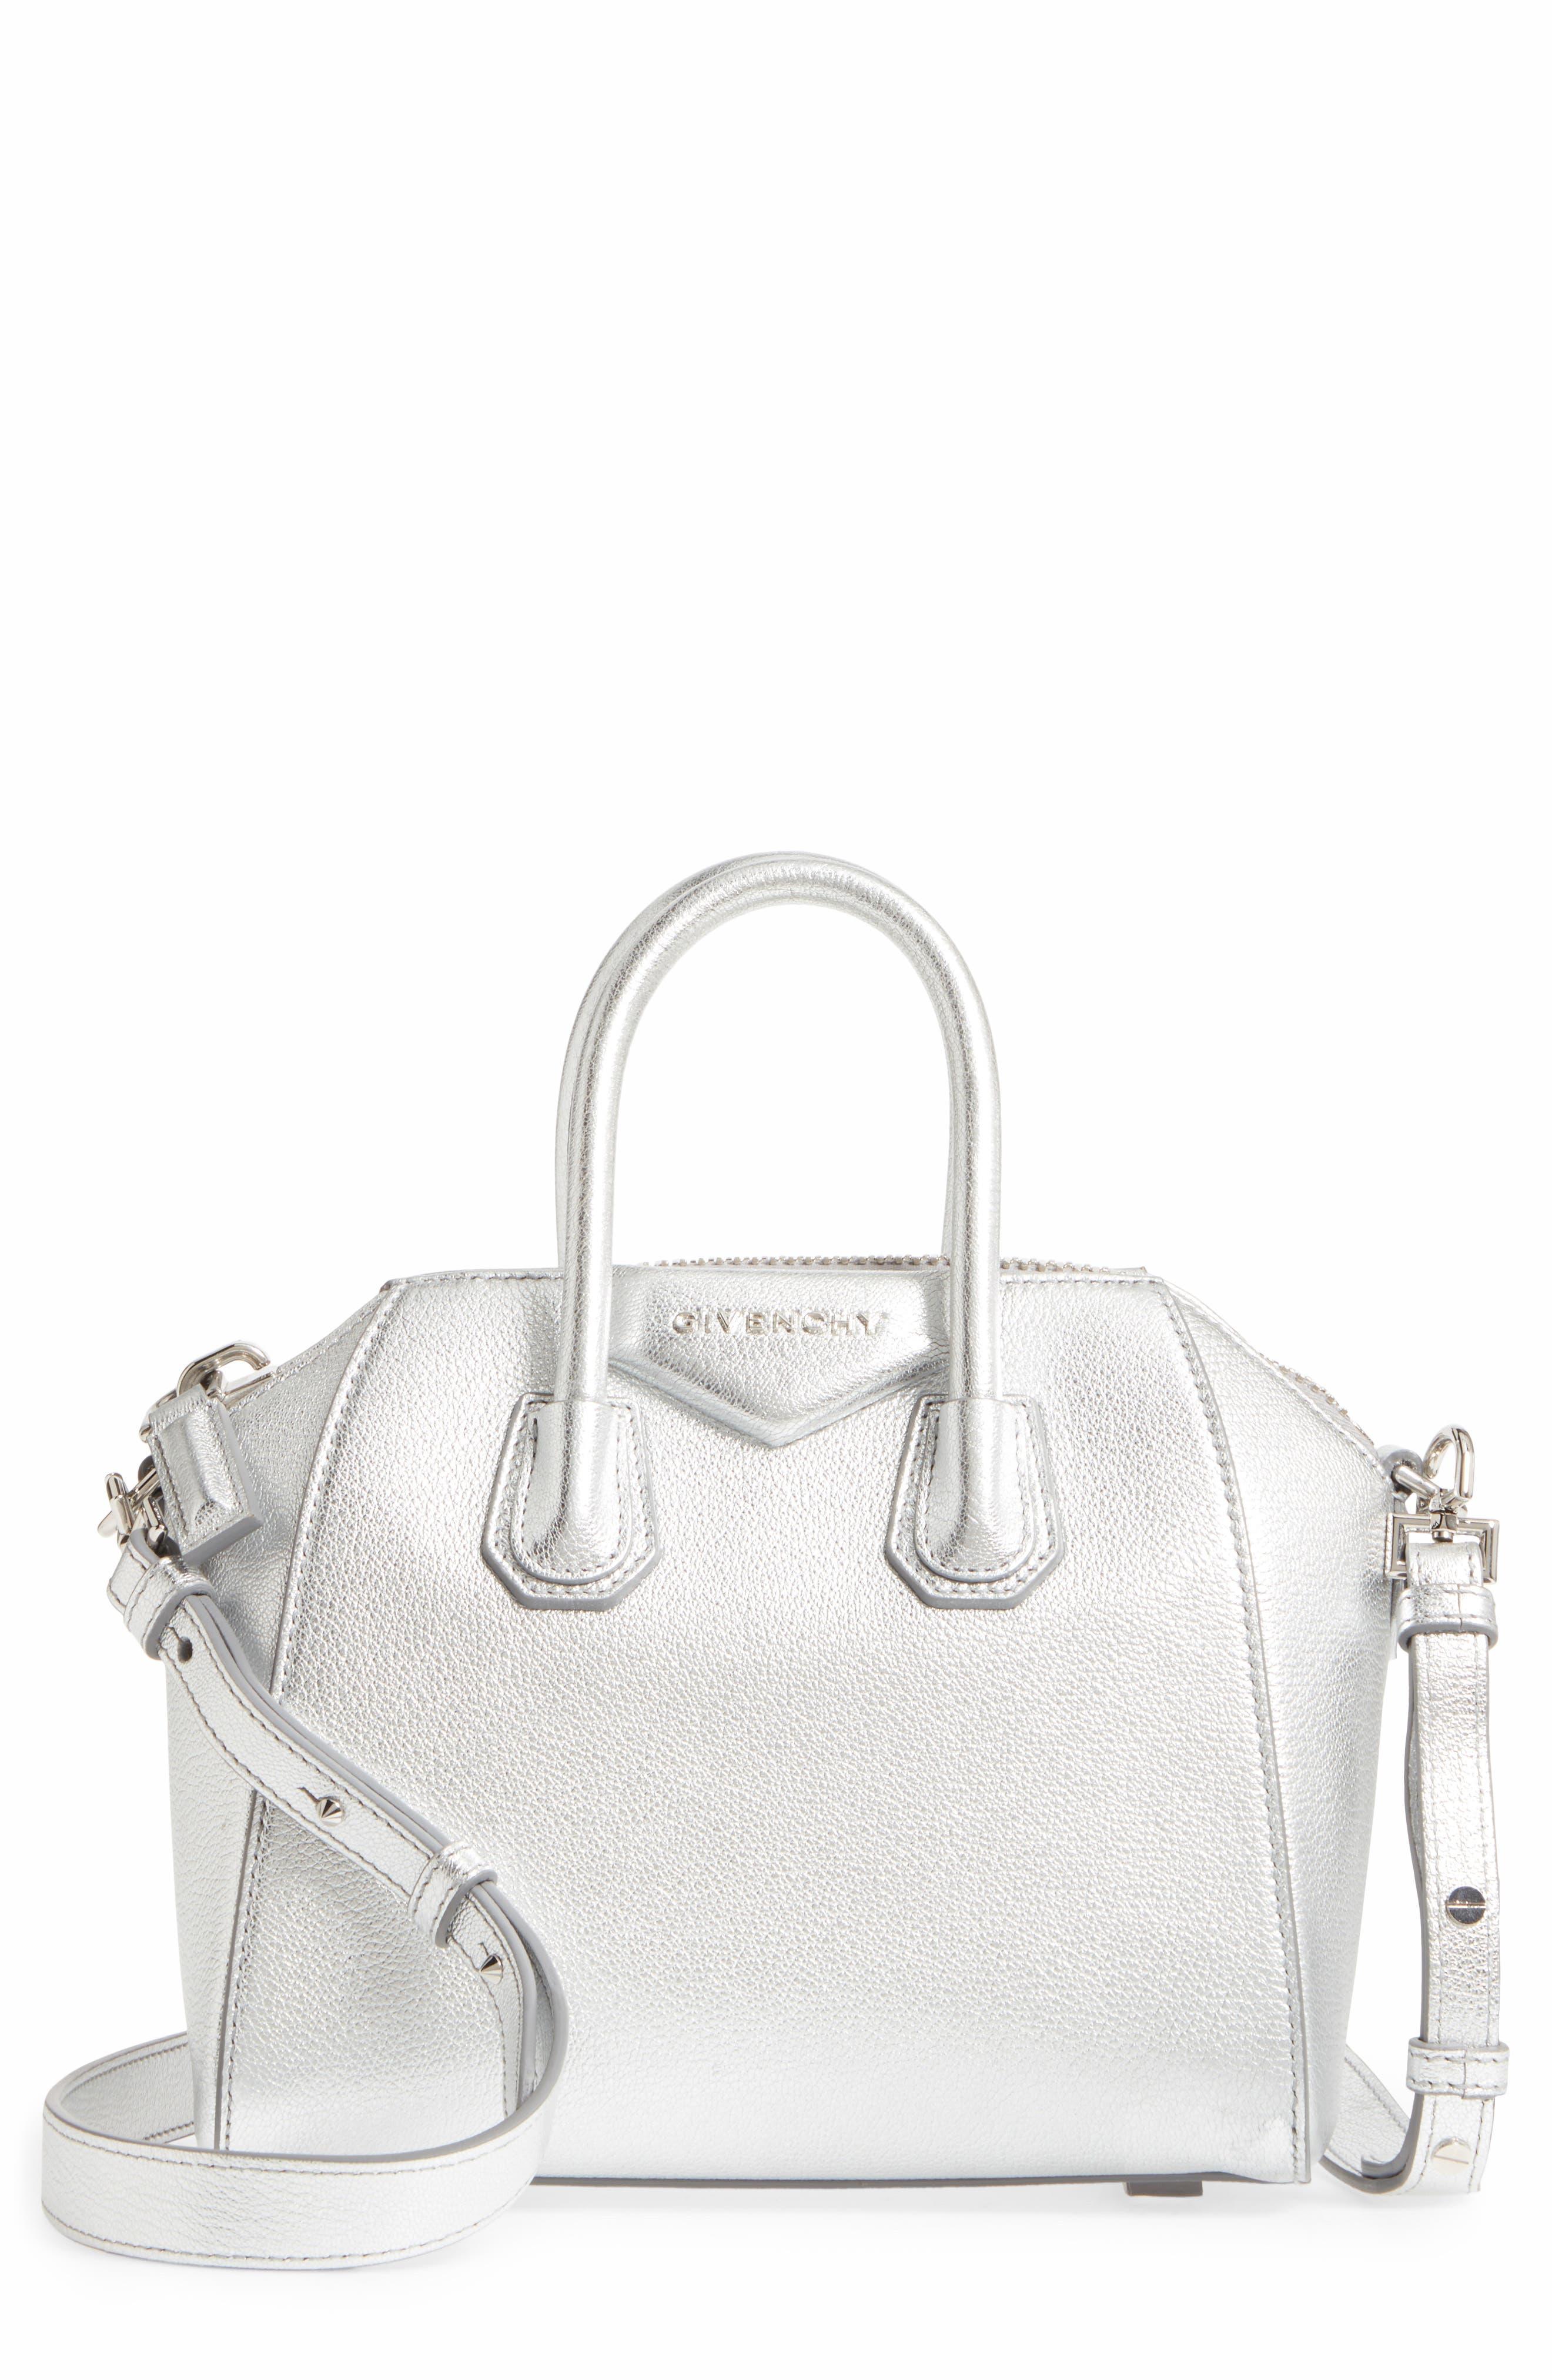 Main Image - Givenchy Mini Antigona Metallic Leather Satchel